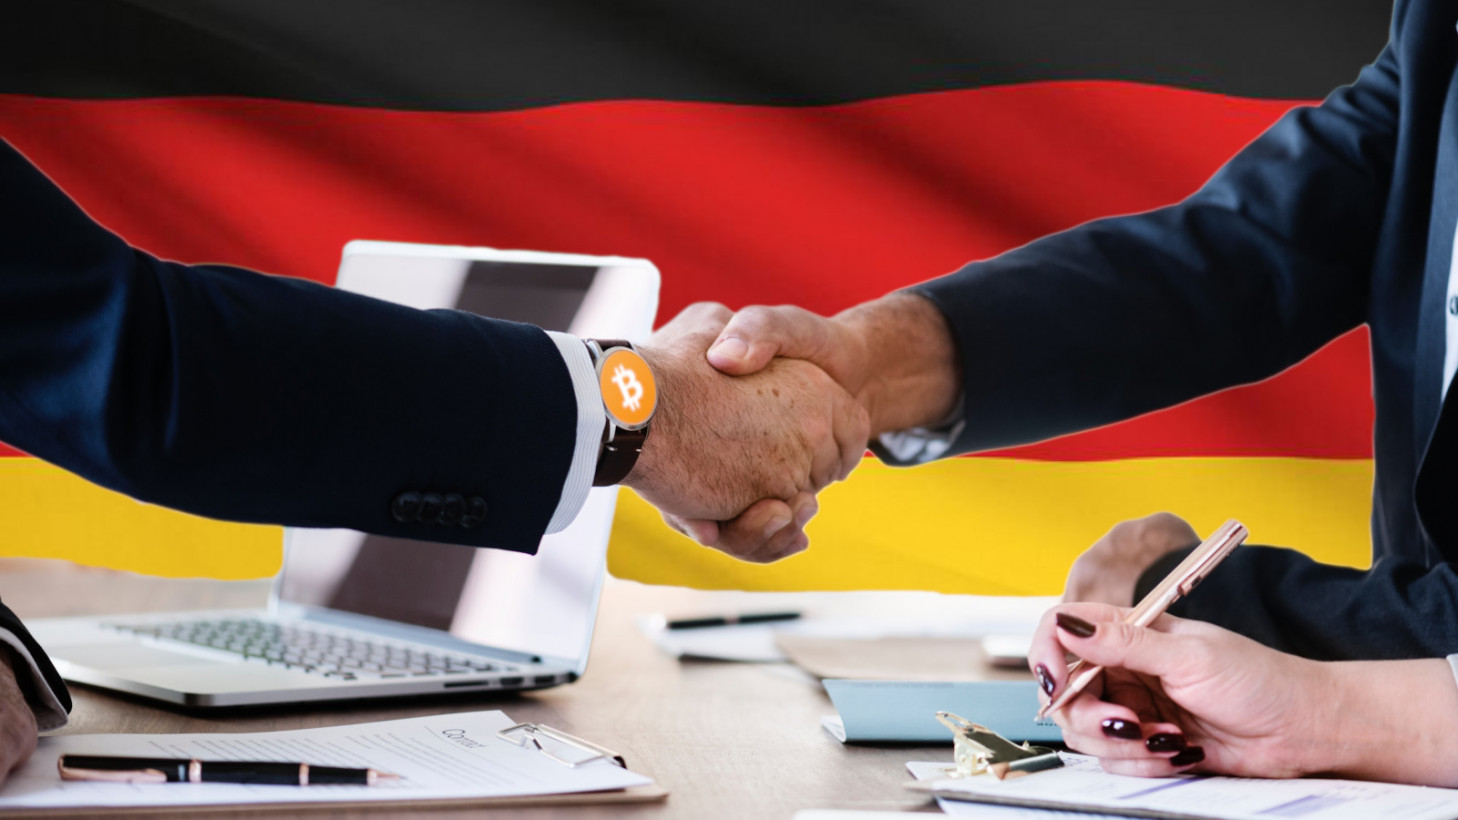 thenextweb.com - Matthew Beedham - German Bitcoin exchange buys investment bank